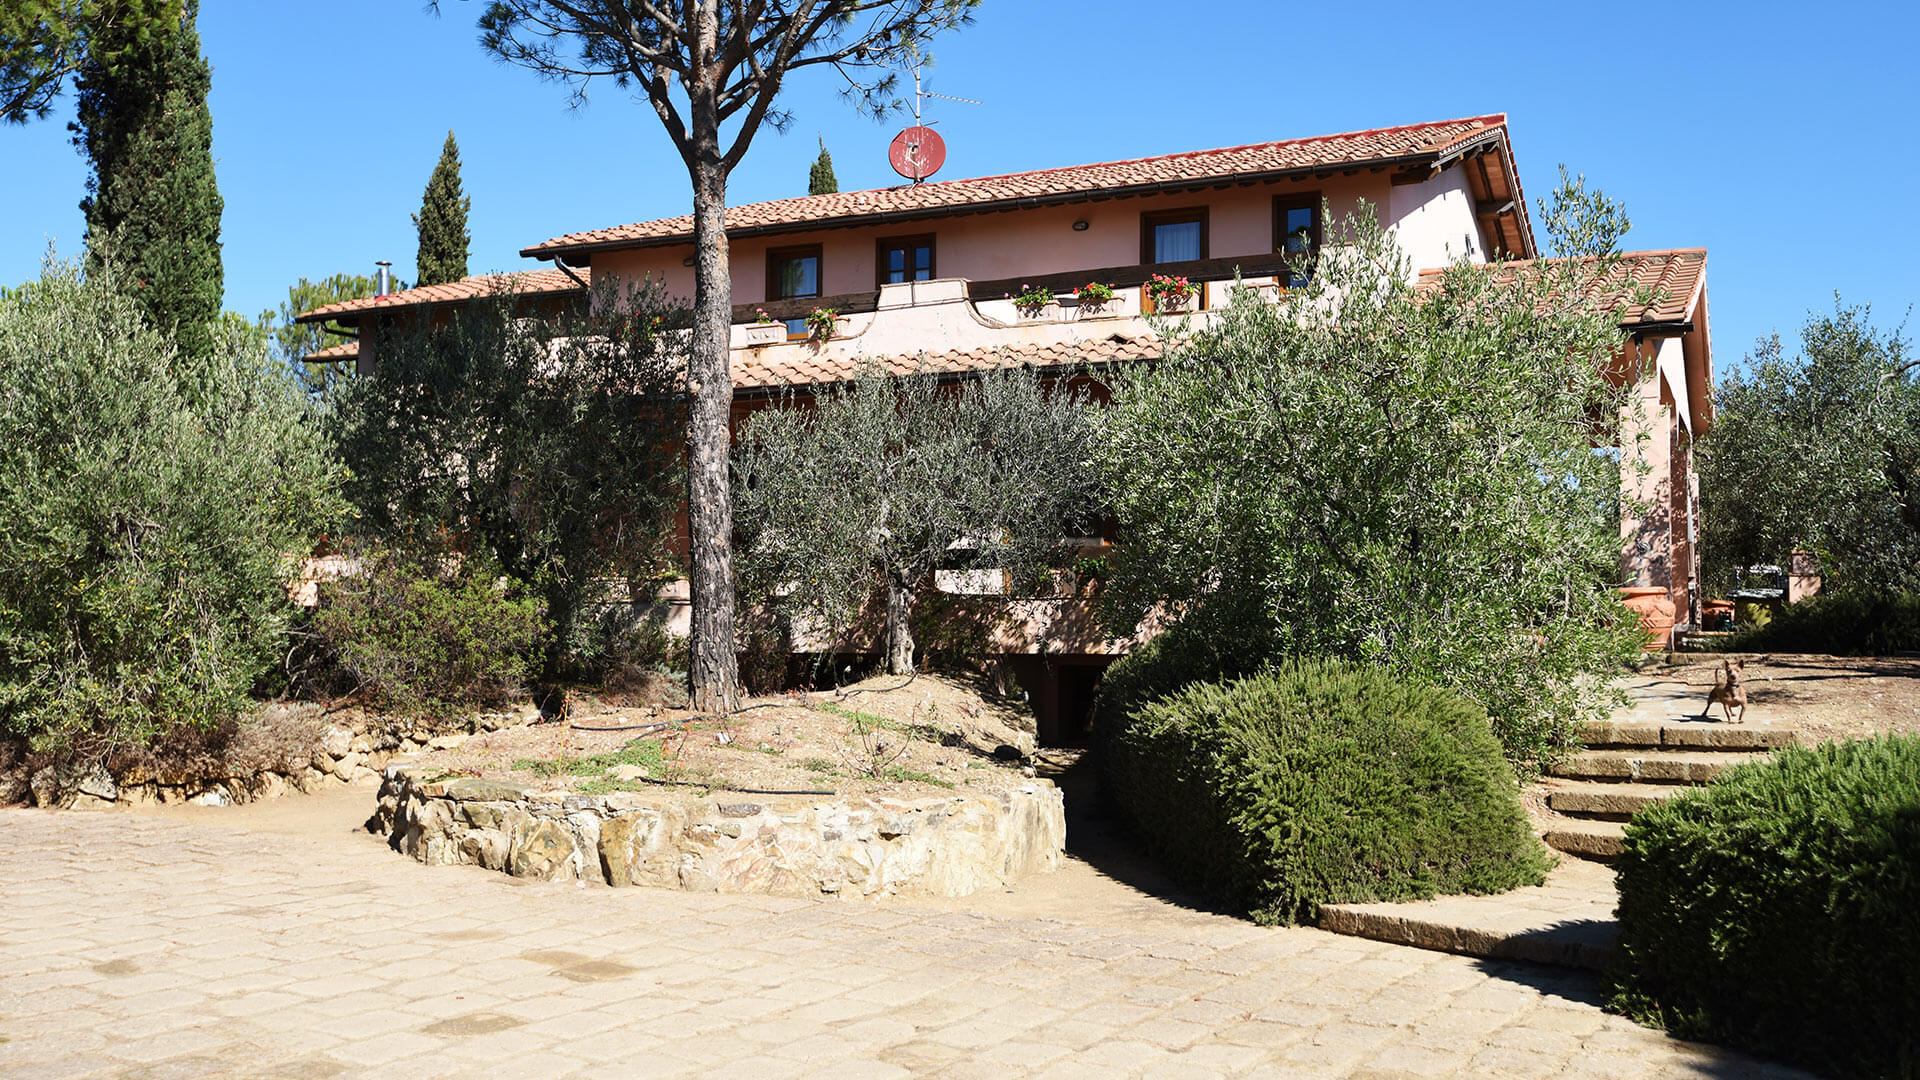 Villa Villa Valania, Location à Toscane